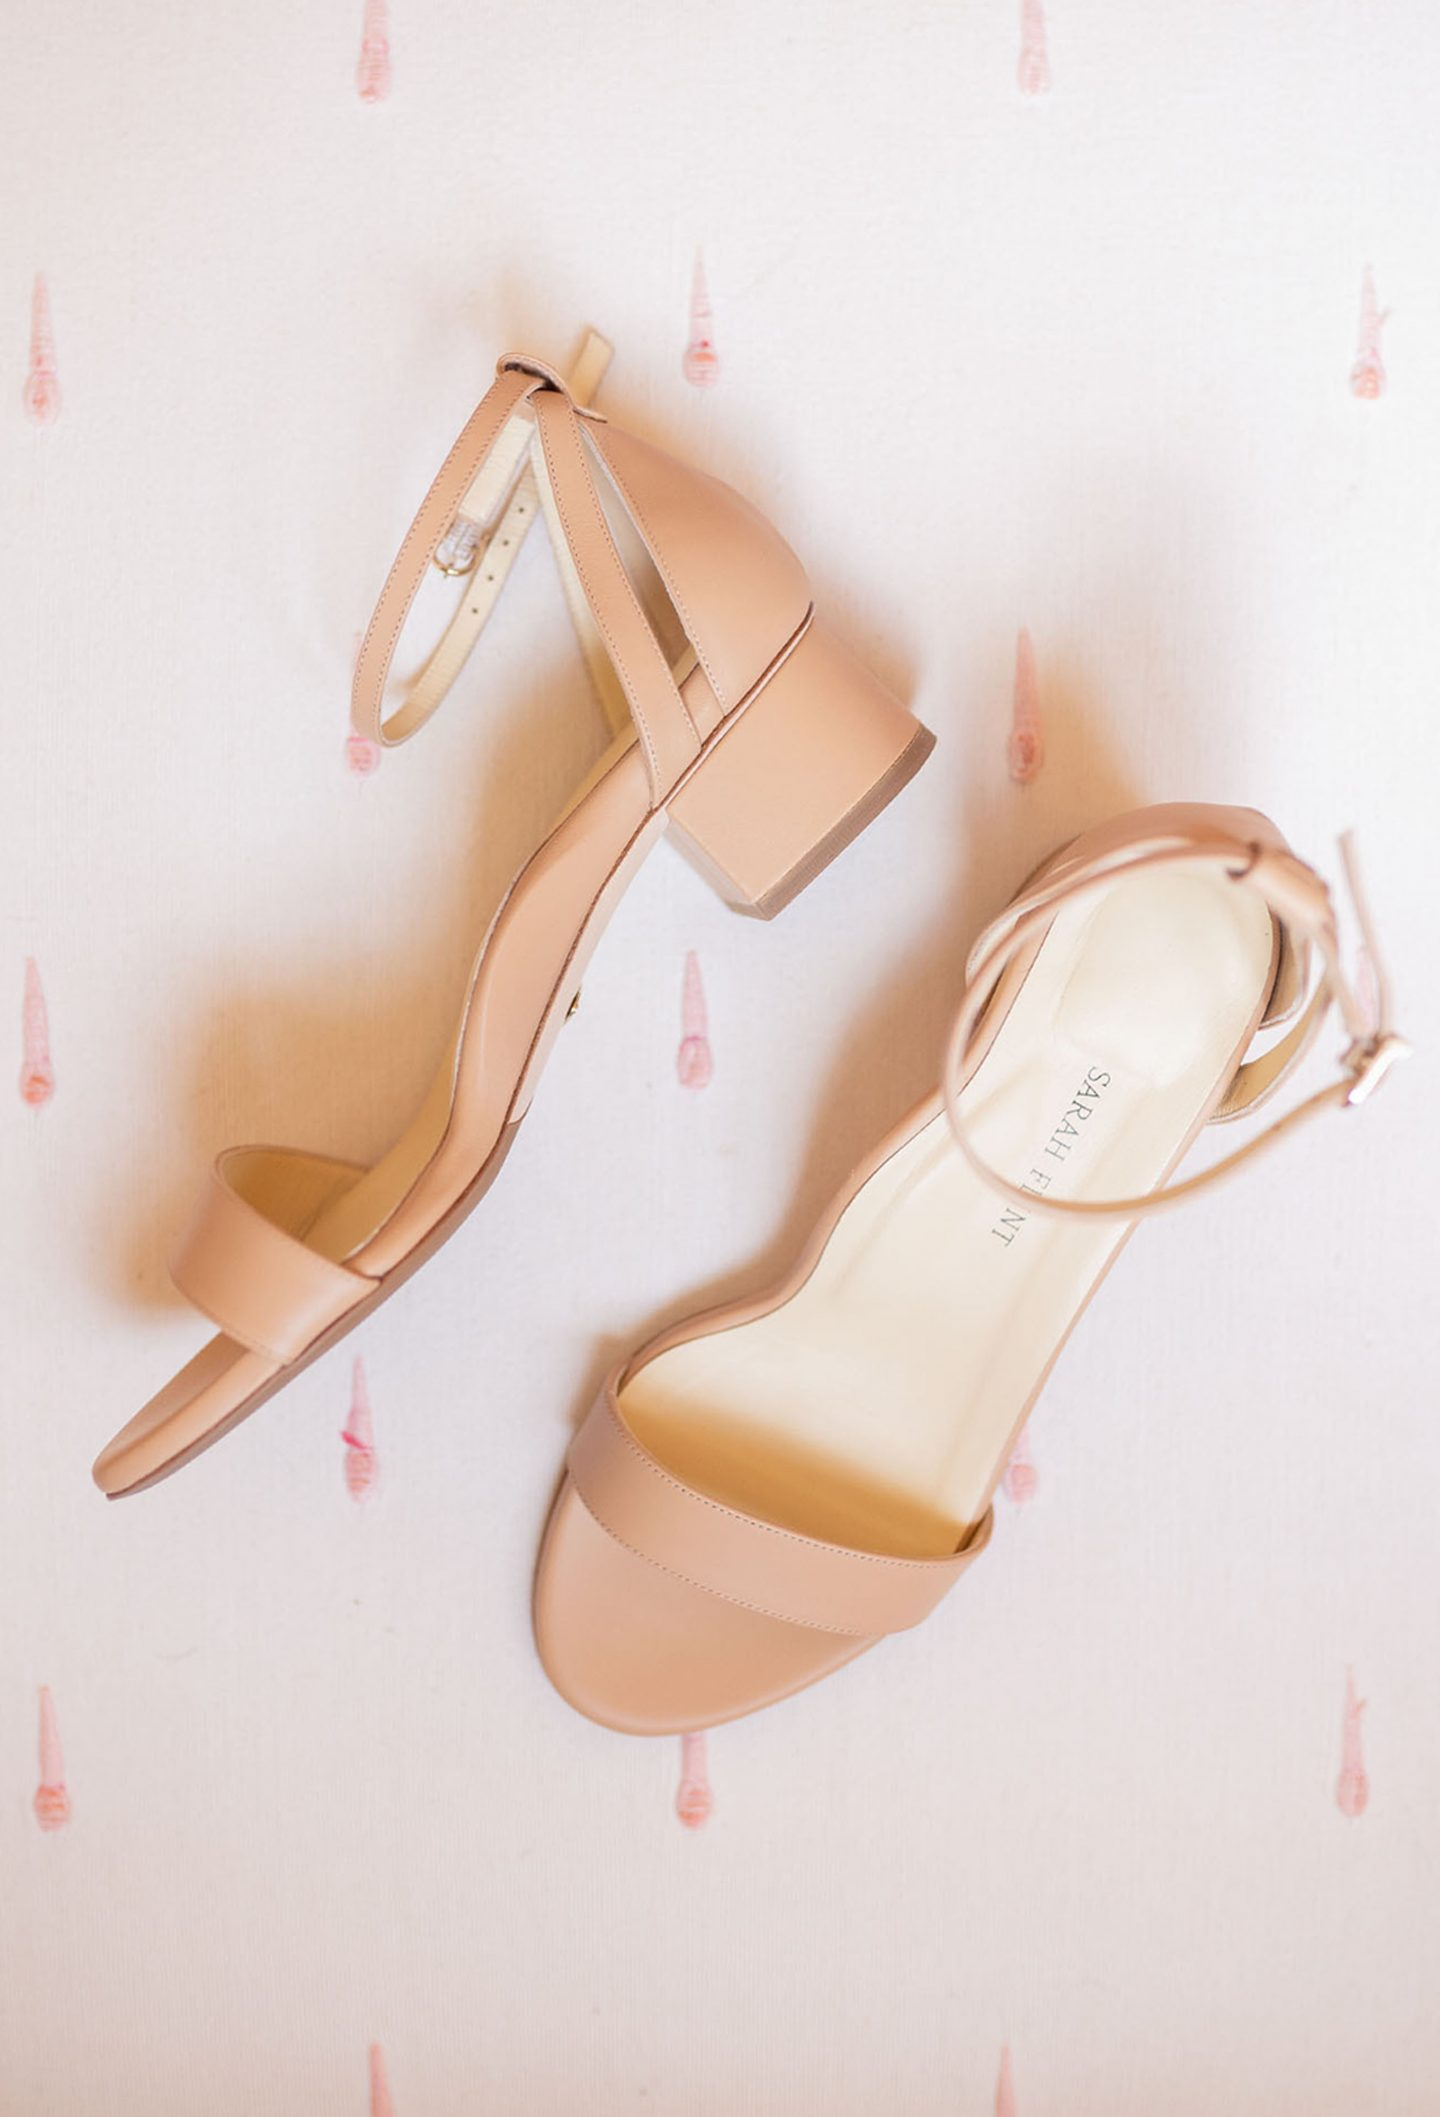 Sarah Flint Shoes worn by Ashley Brooke of www.ashleybrookedesigns.com